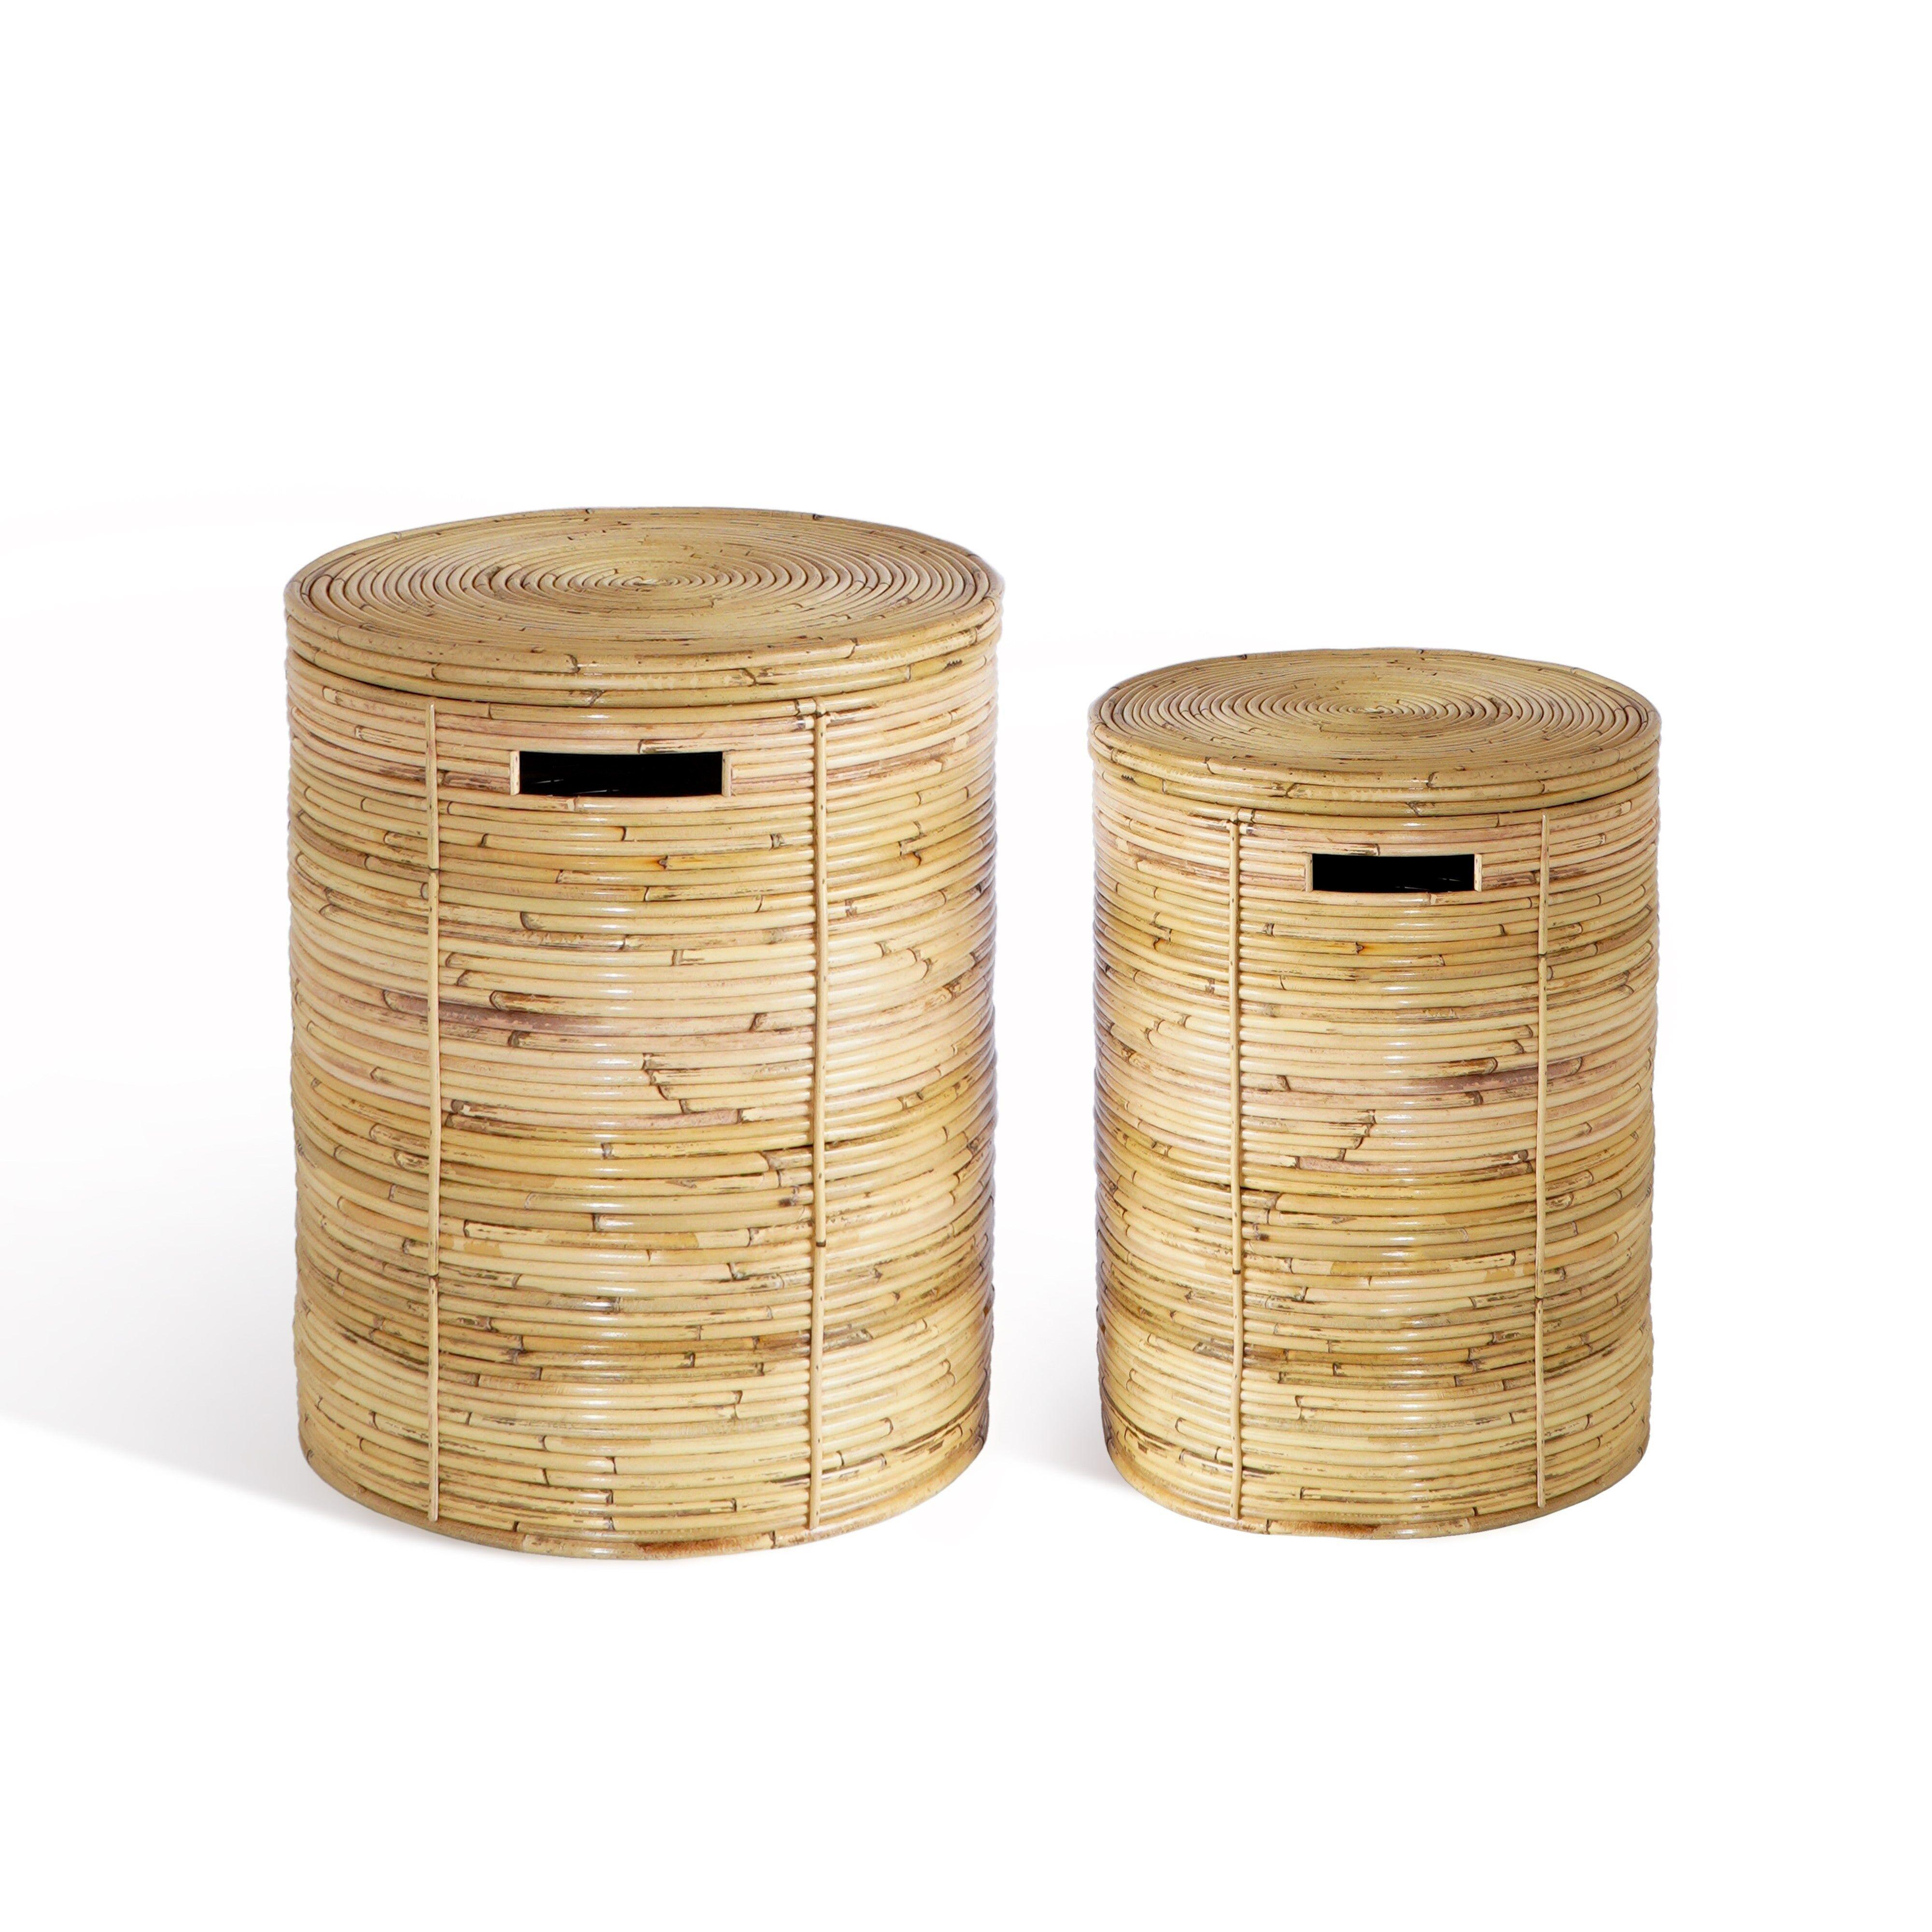 Nimara.dk Vilmar - Vasketøjskurve sæt i bambus flet med låg